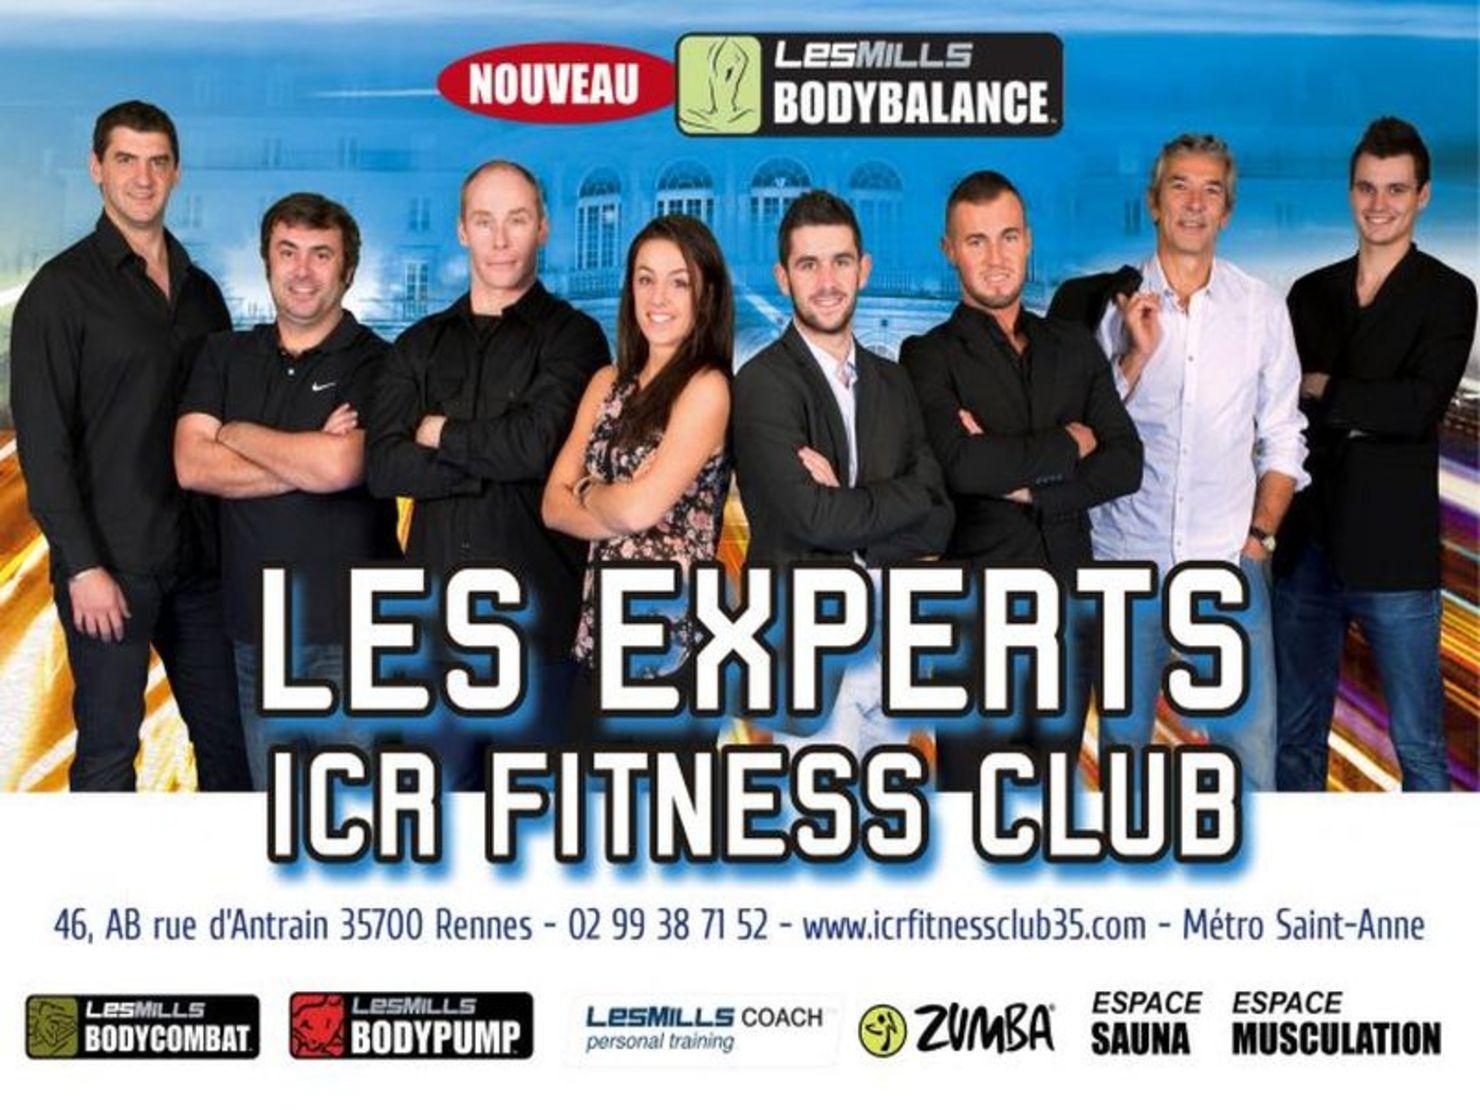 ICR Fitness Club